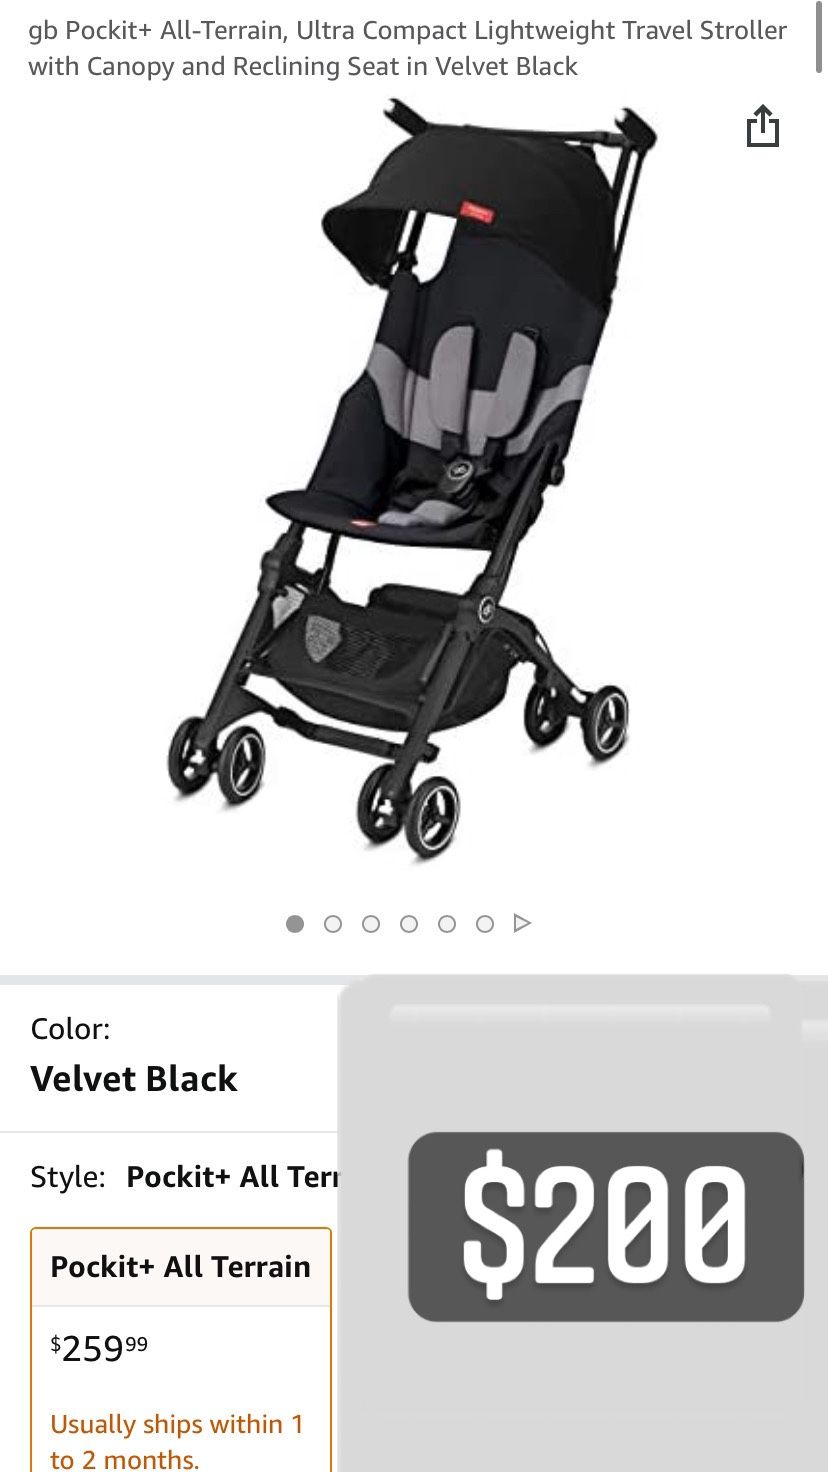 Pocket Air Stroller